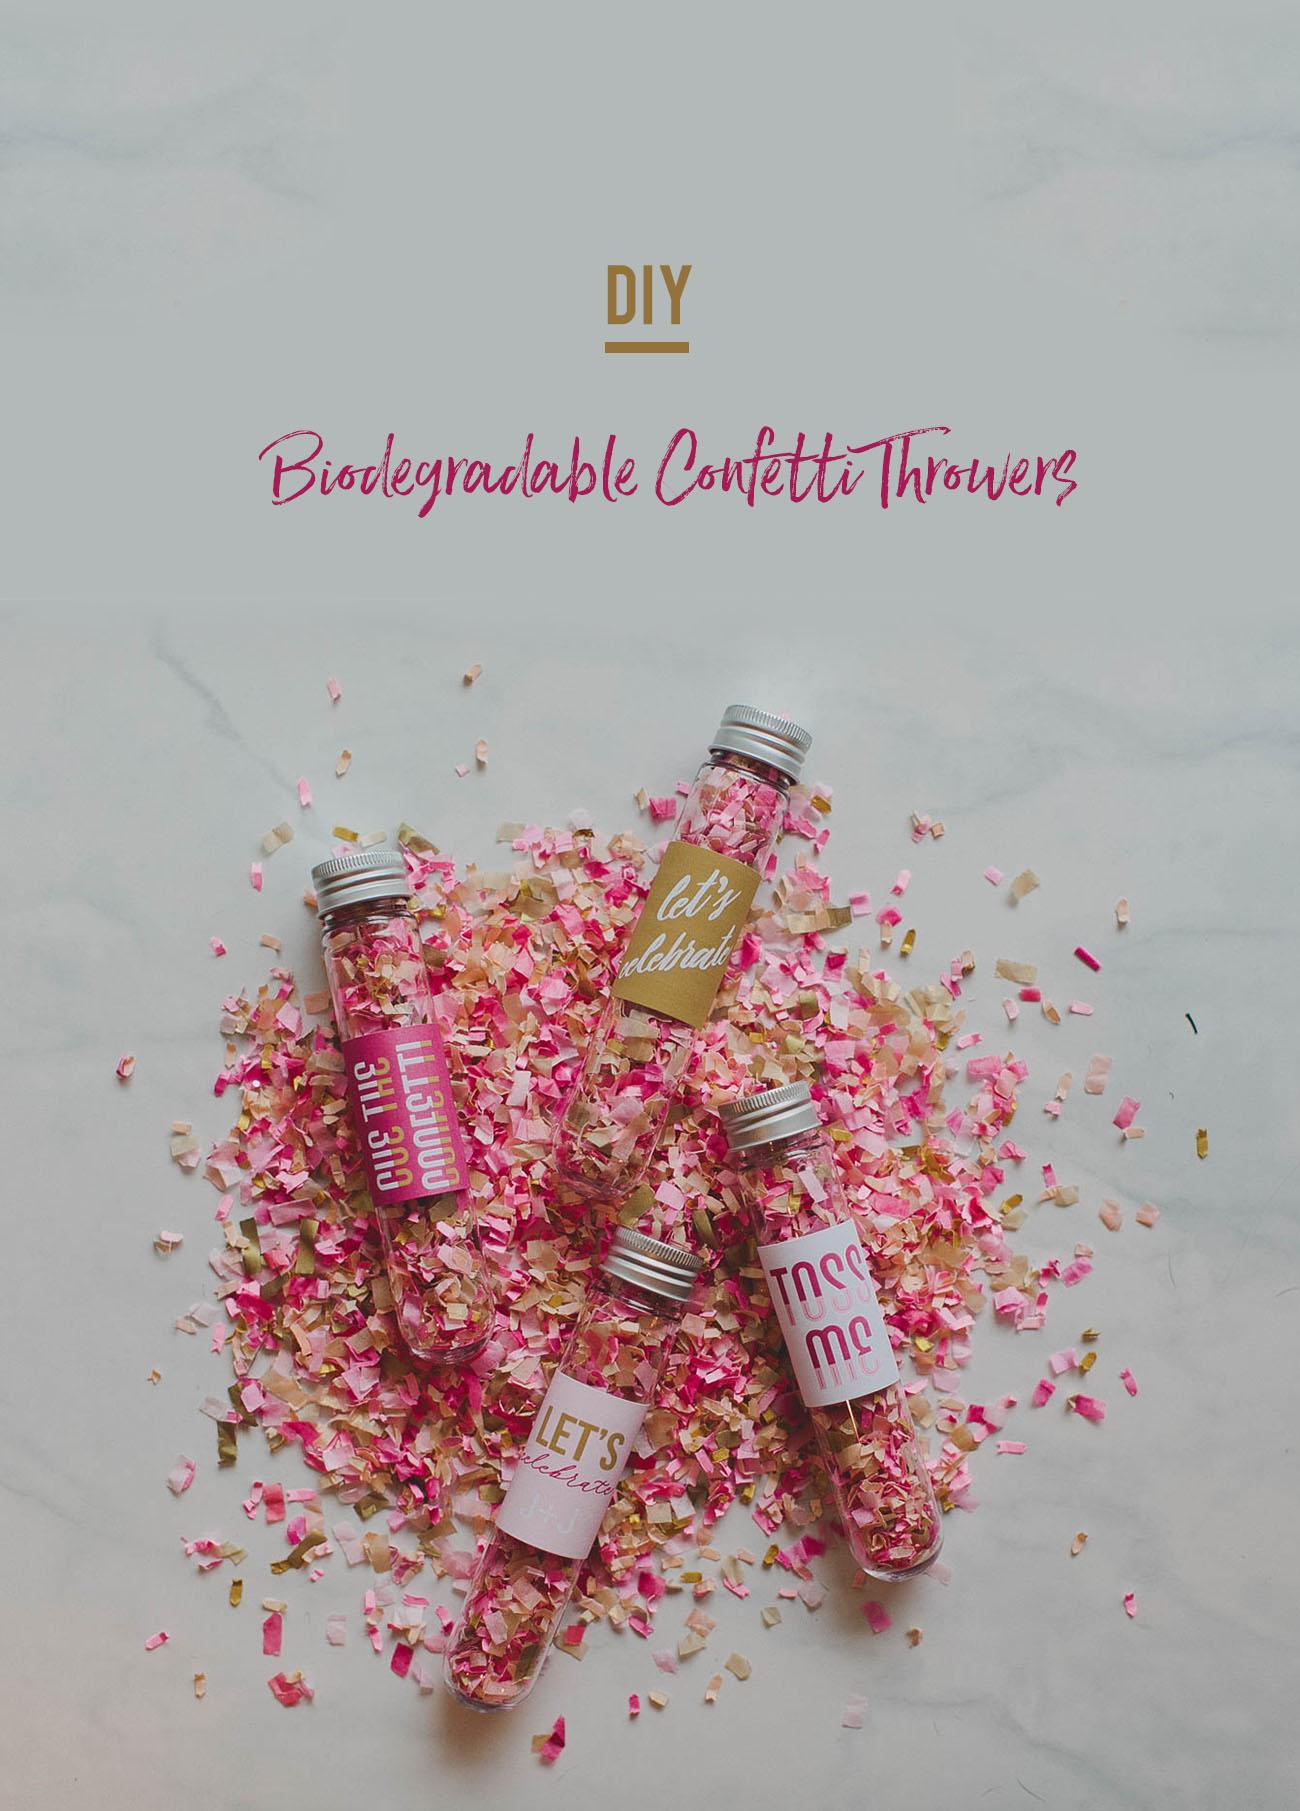 DIY Biodegradable Confetti Thrower